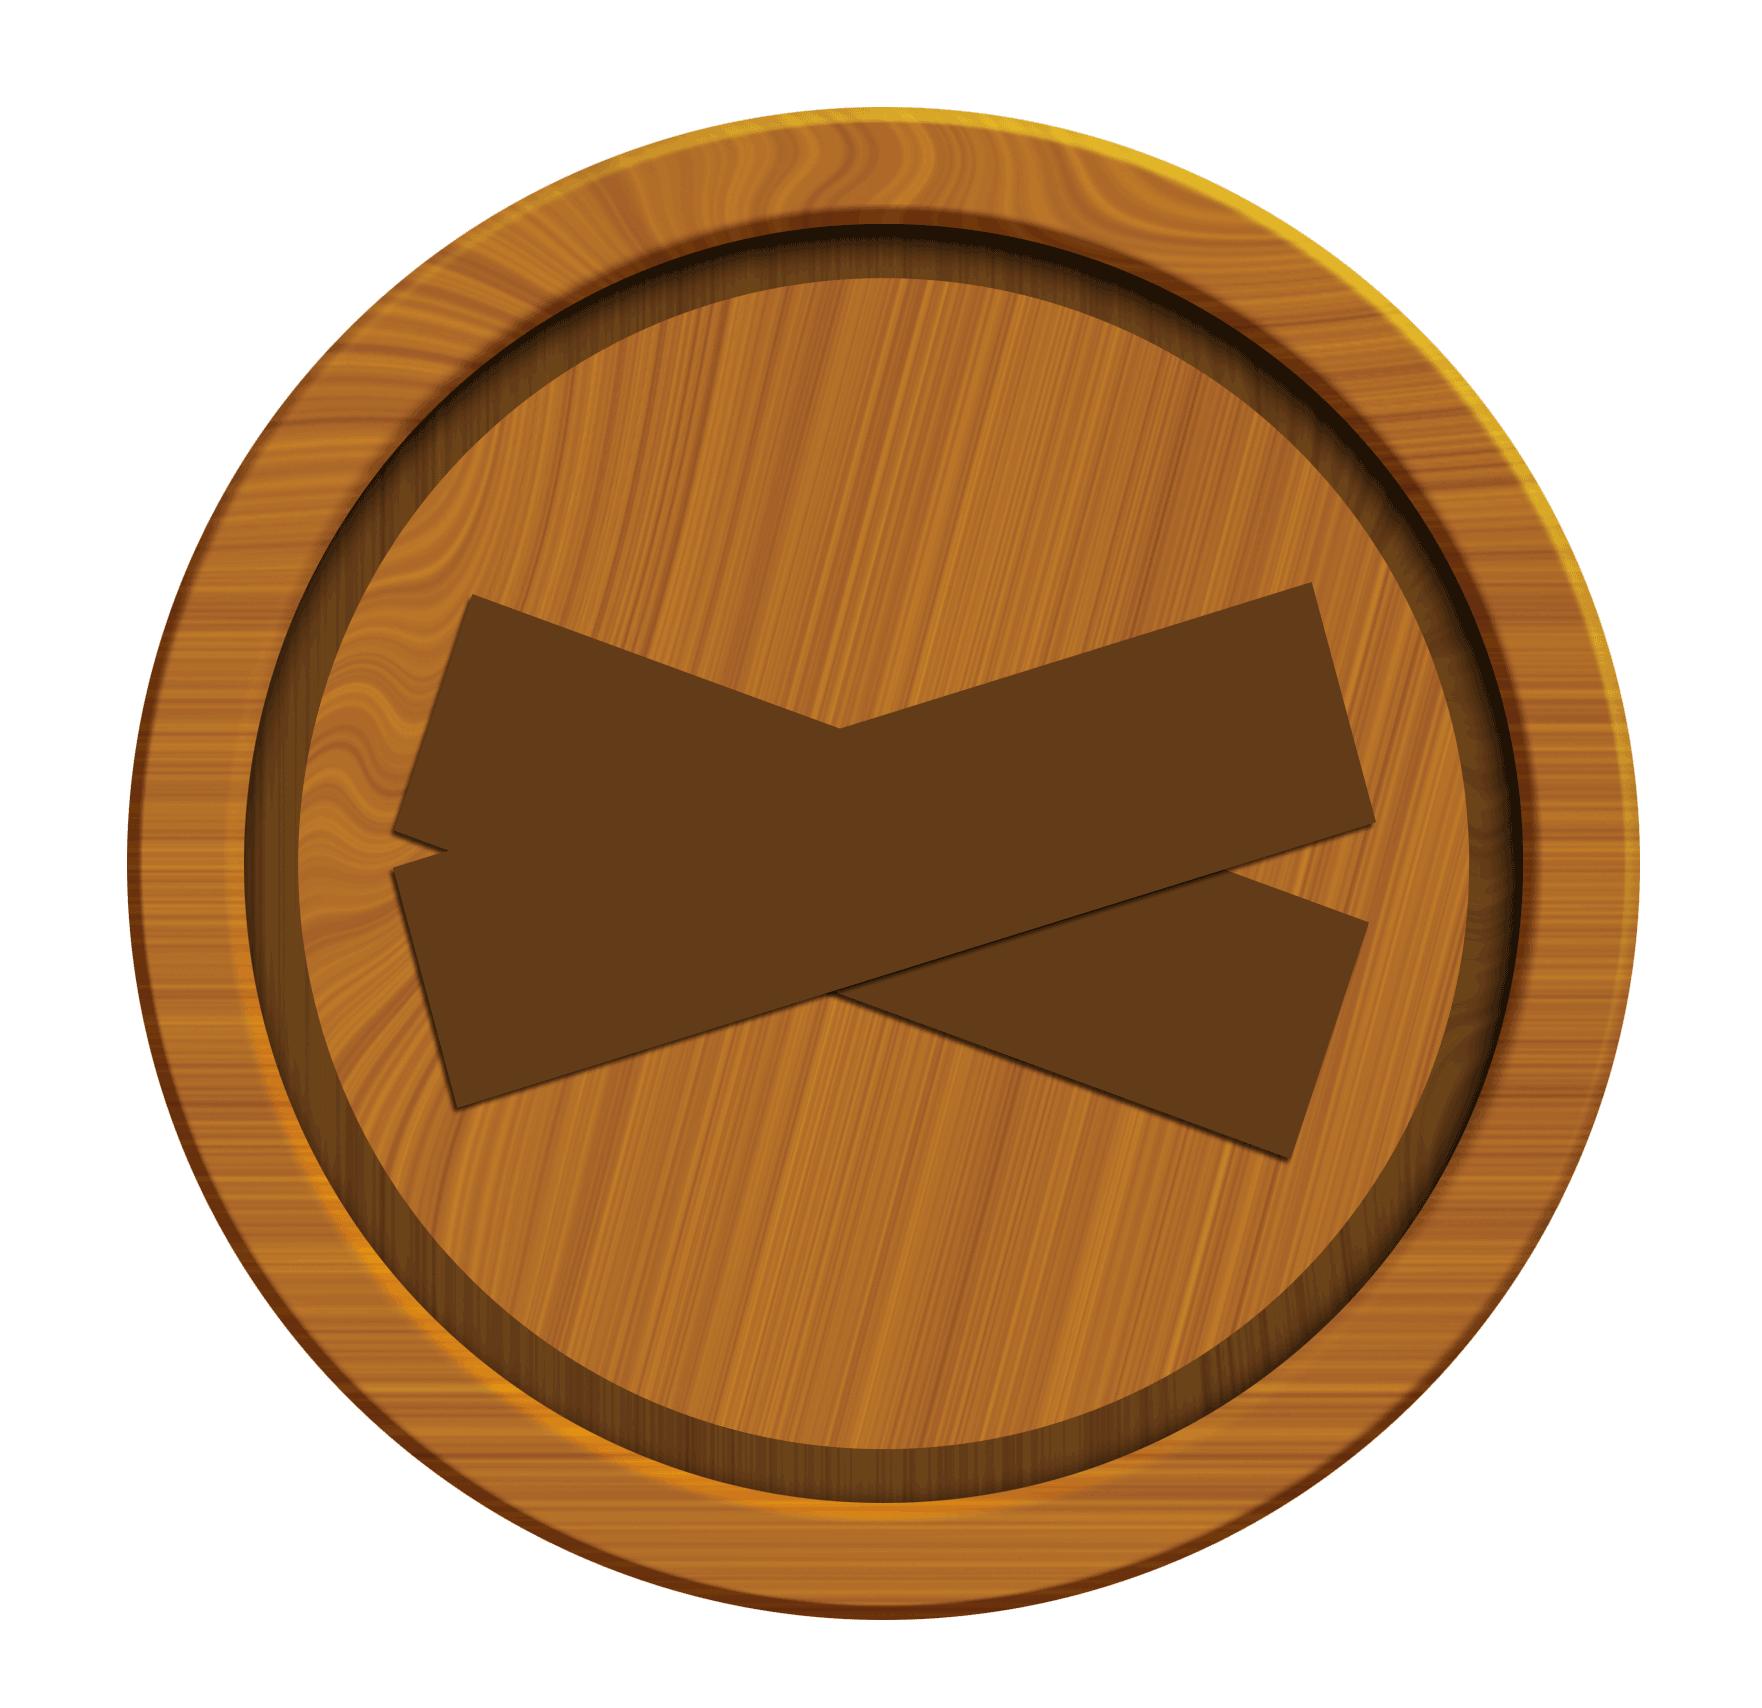 Logs clipart timber. Hiram wood